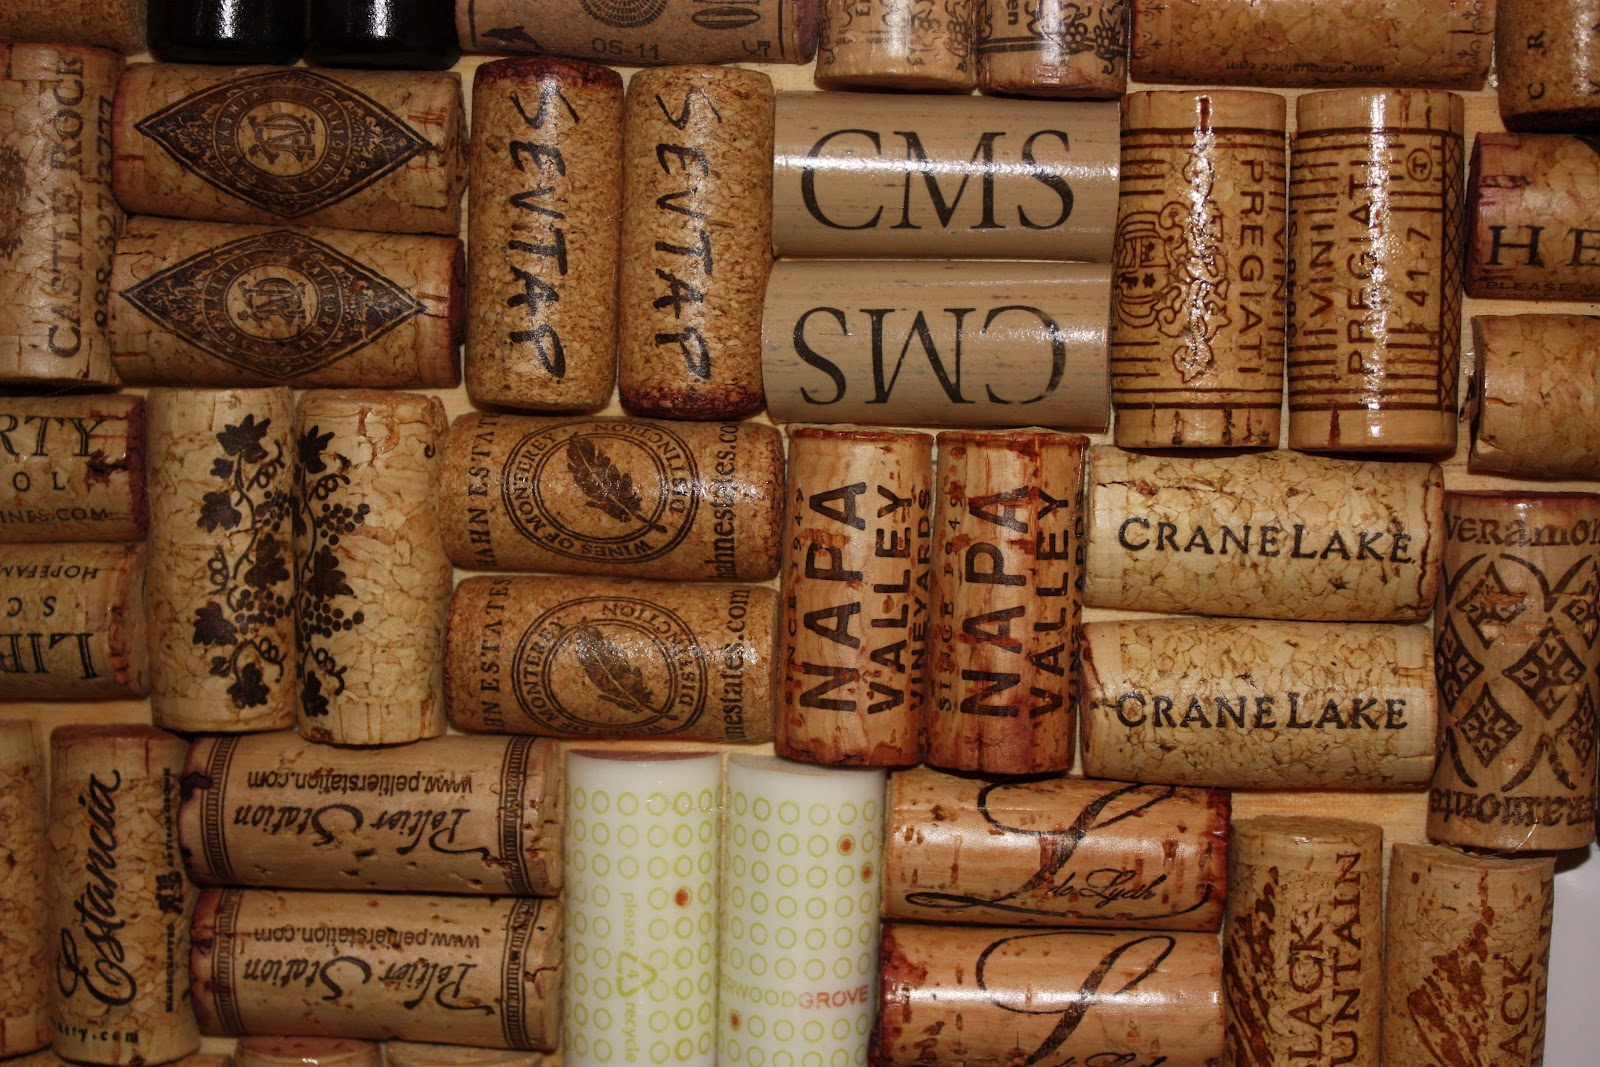 mandy in minneapoland wine cork backsplash